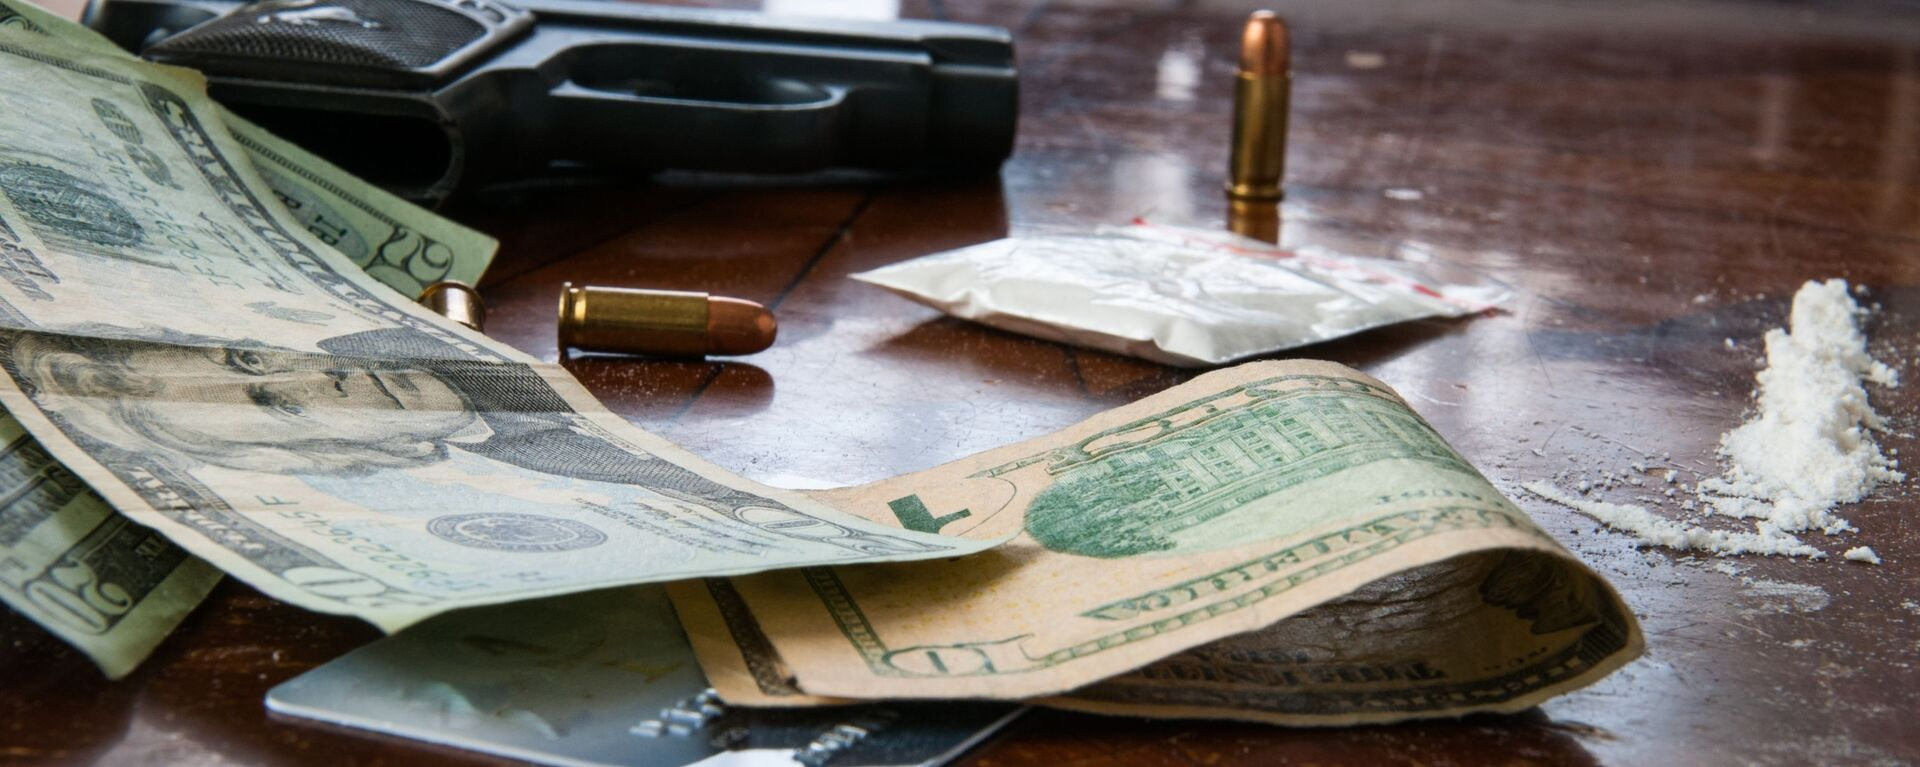 Cocaína, dólares y balas - Sputnik Mundo, 1920, 12.01.2021